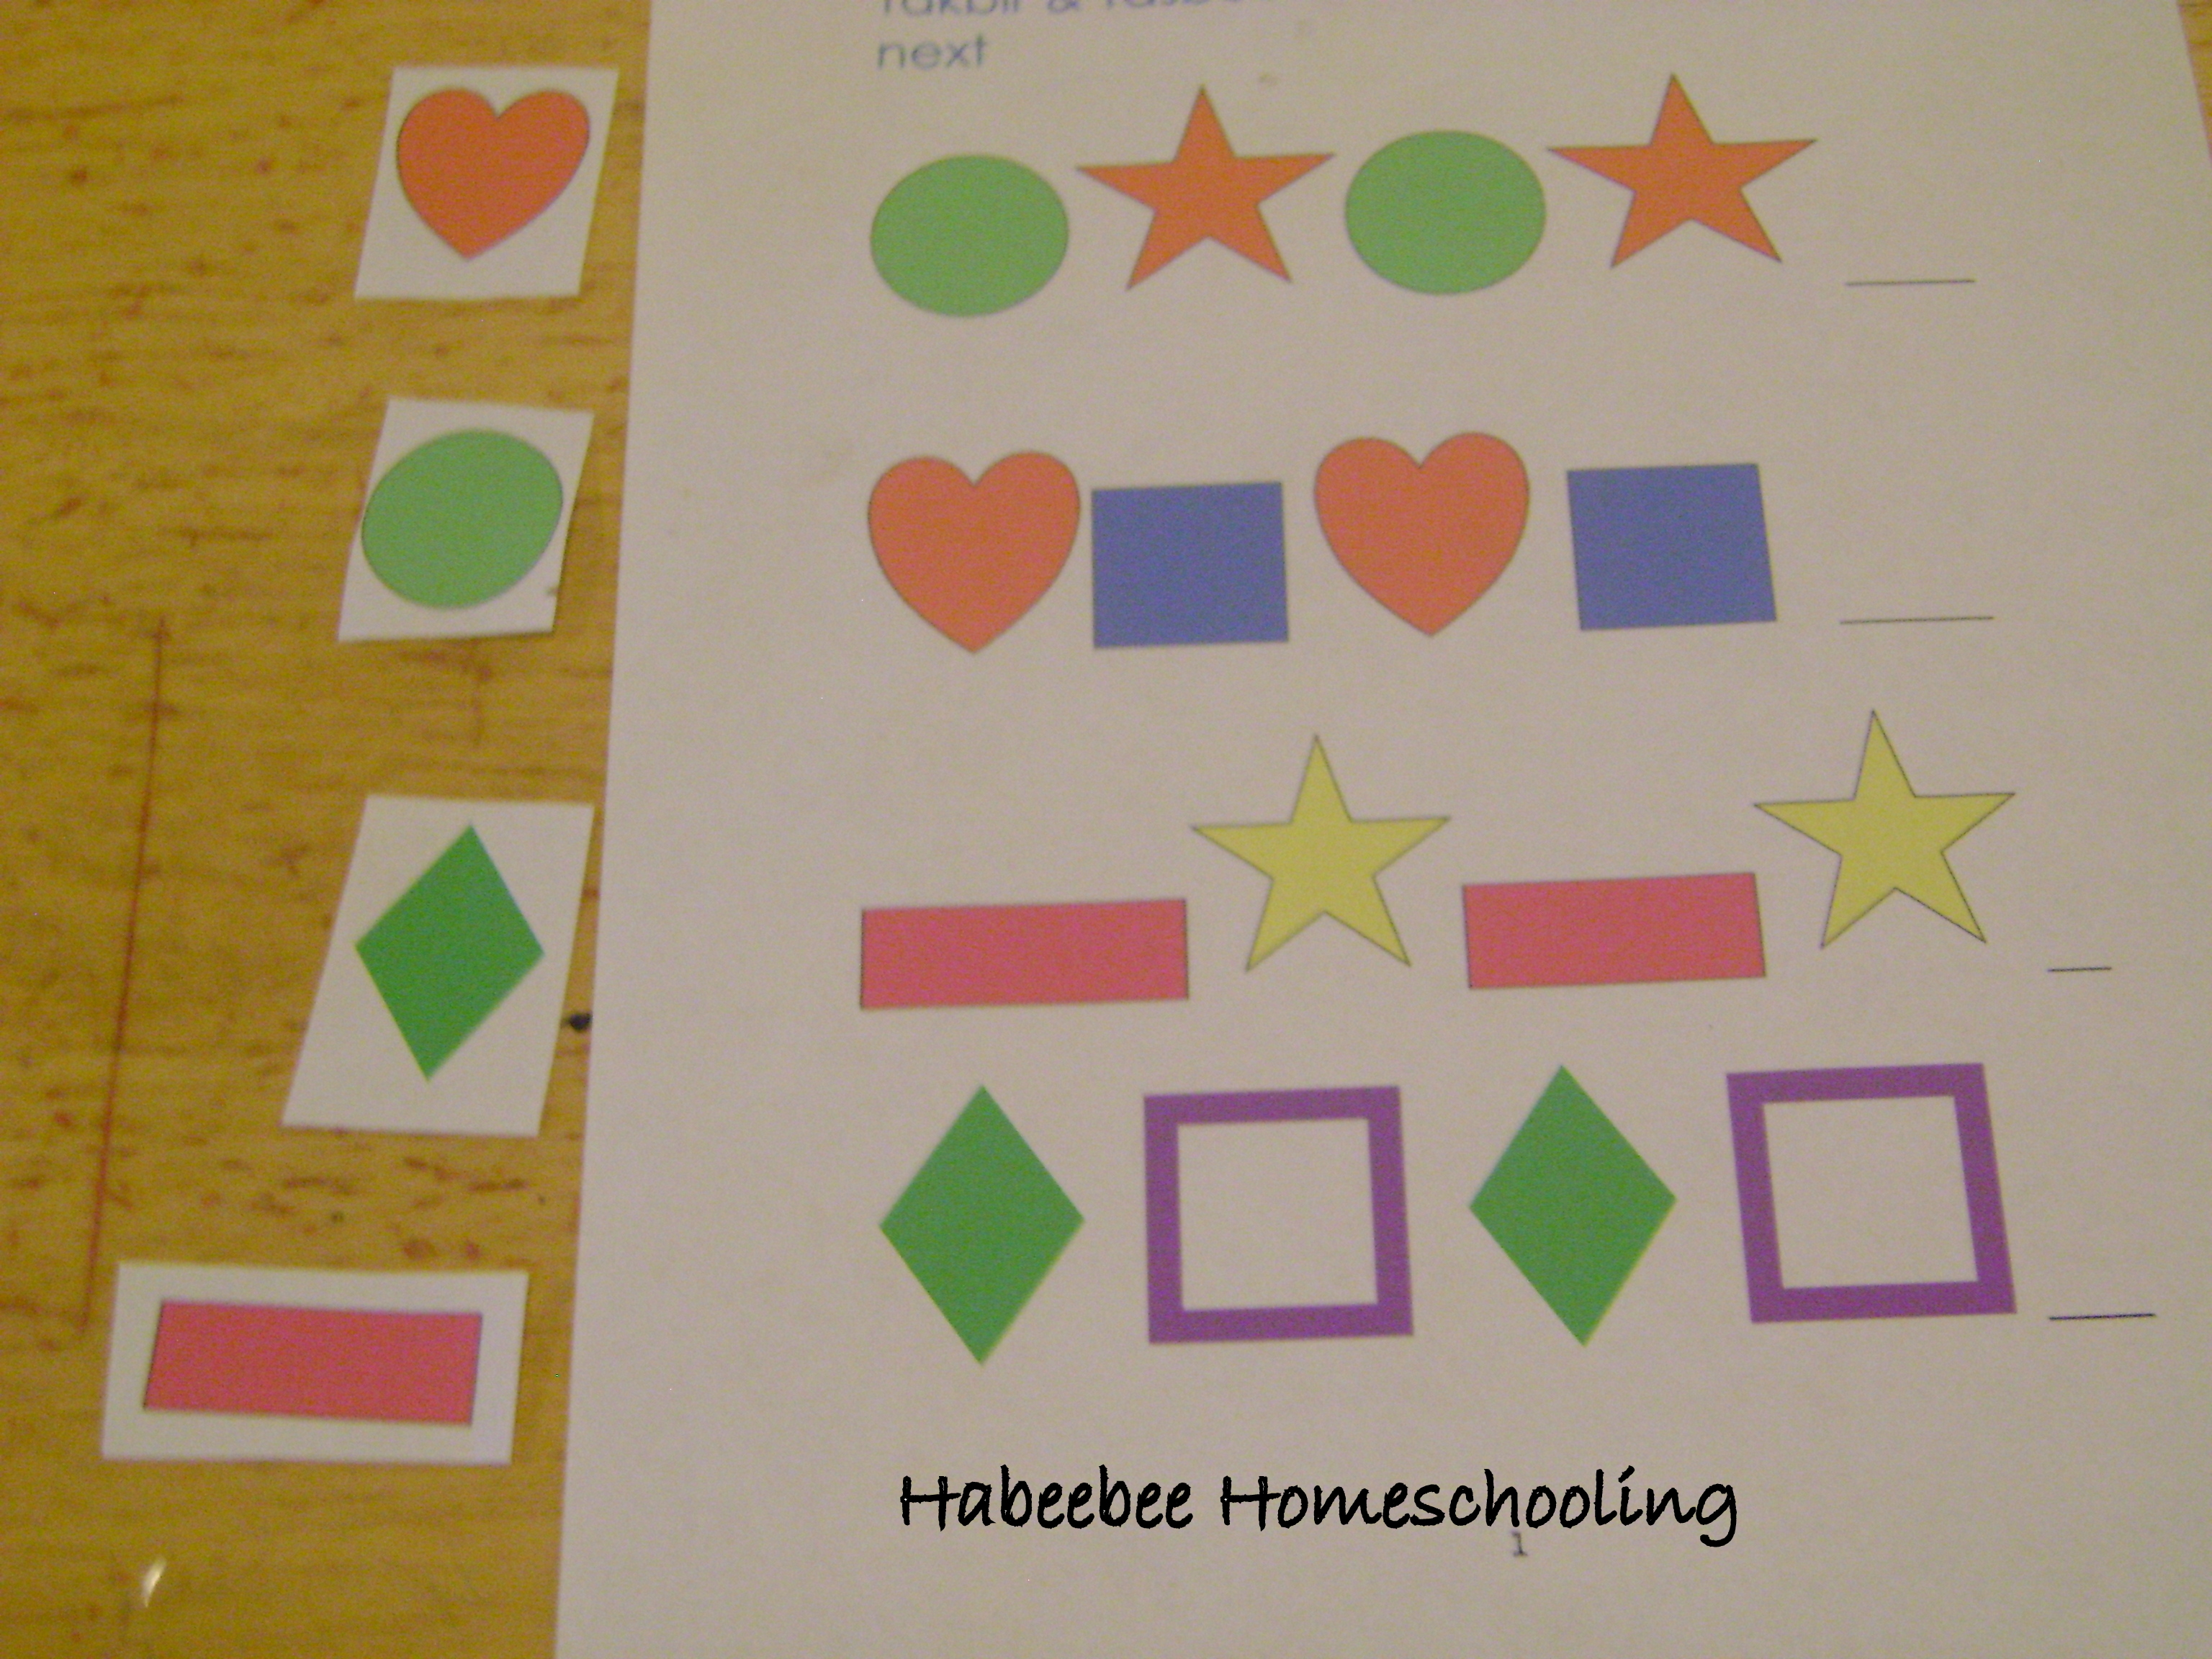 Habeebee Homeschooling